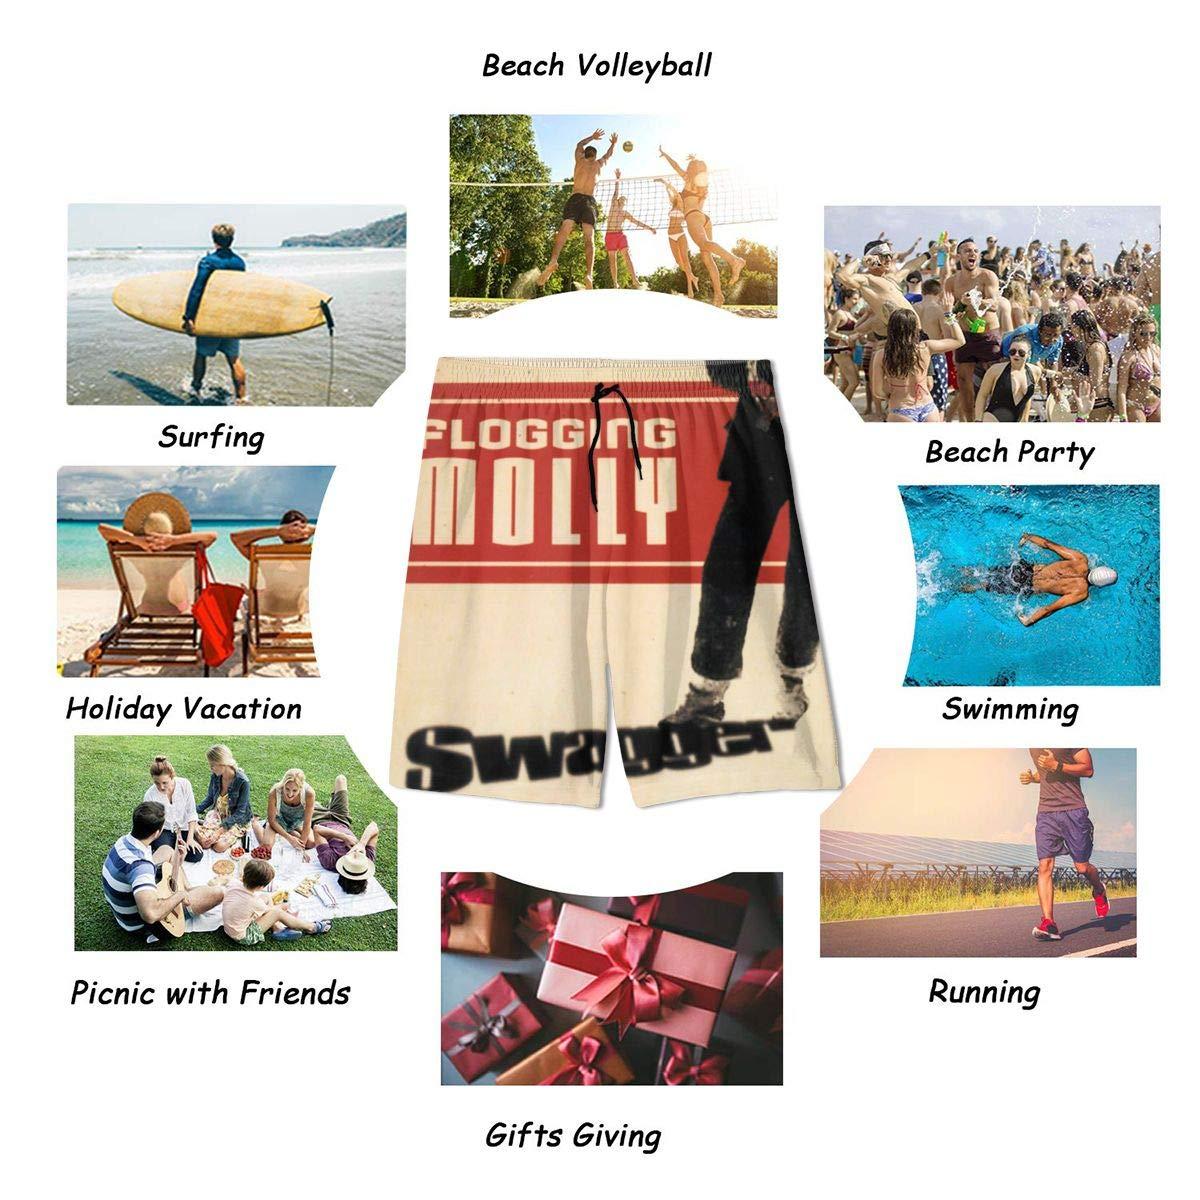 JacobKThompson Flogging Molly Summer Adolescent Men Leisure Quick Dry Surfing Beach Shorts Elastic Band Pocket Drawstring